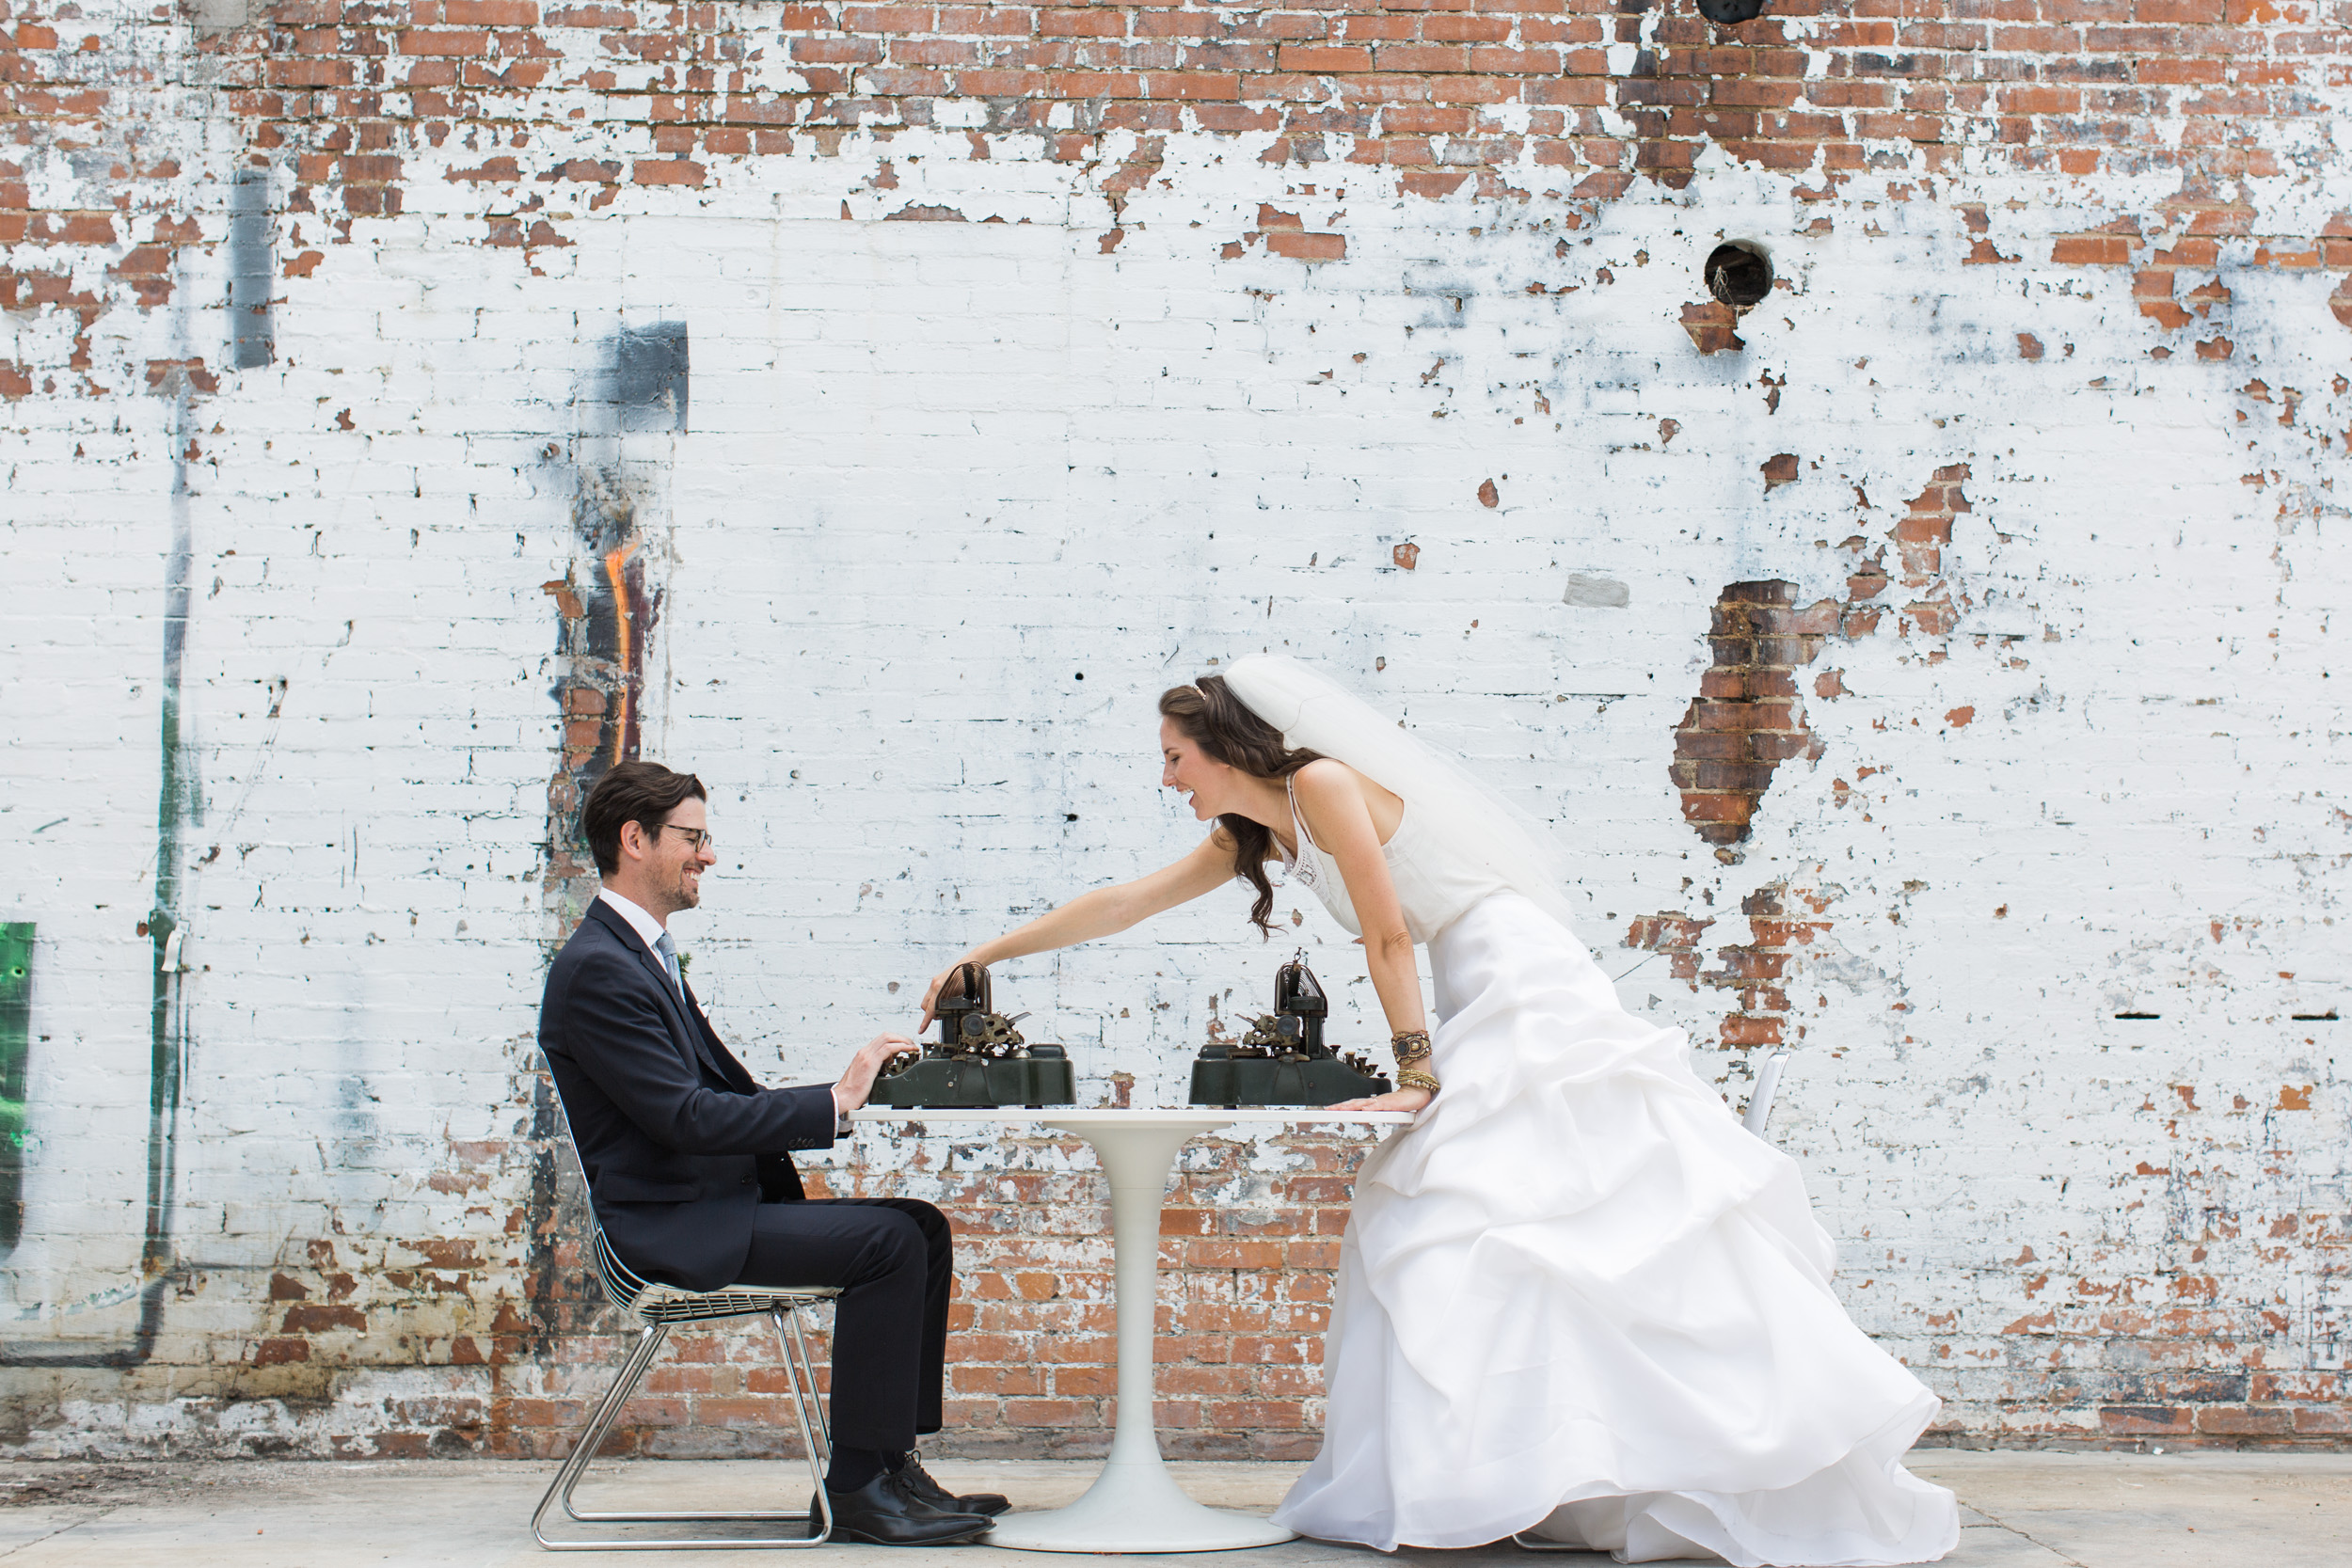 industrial-warehouse-wedding-venue-in-fort-worth-texas.jpg